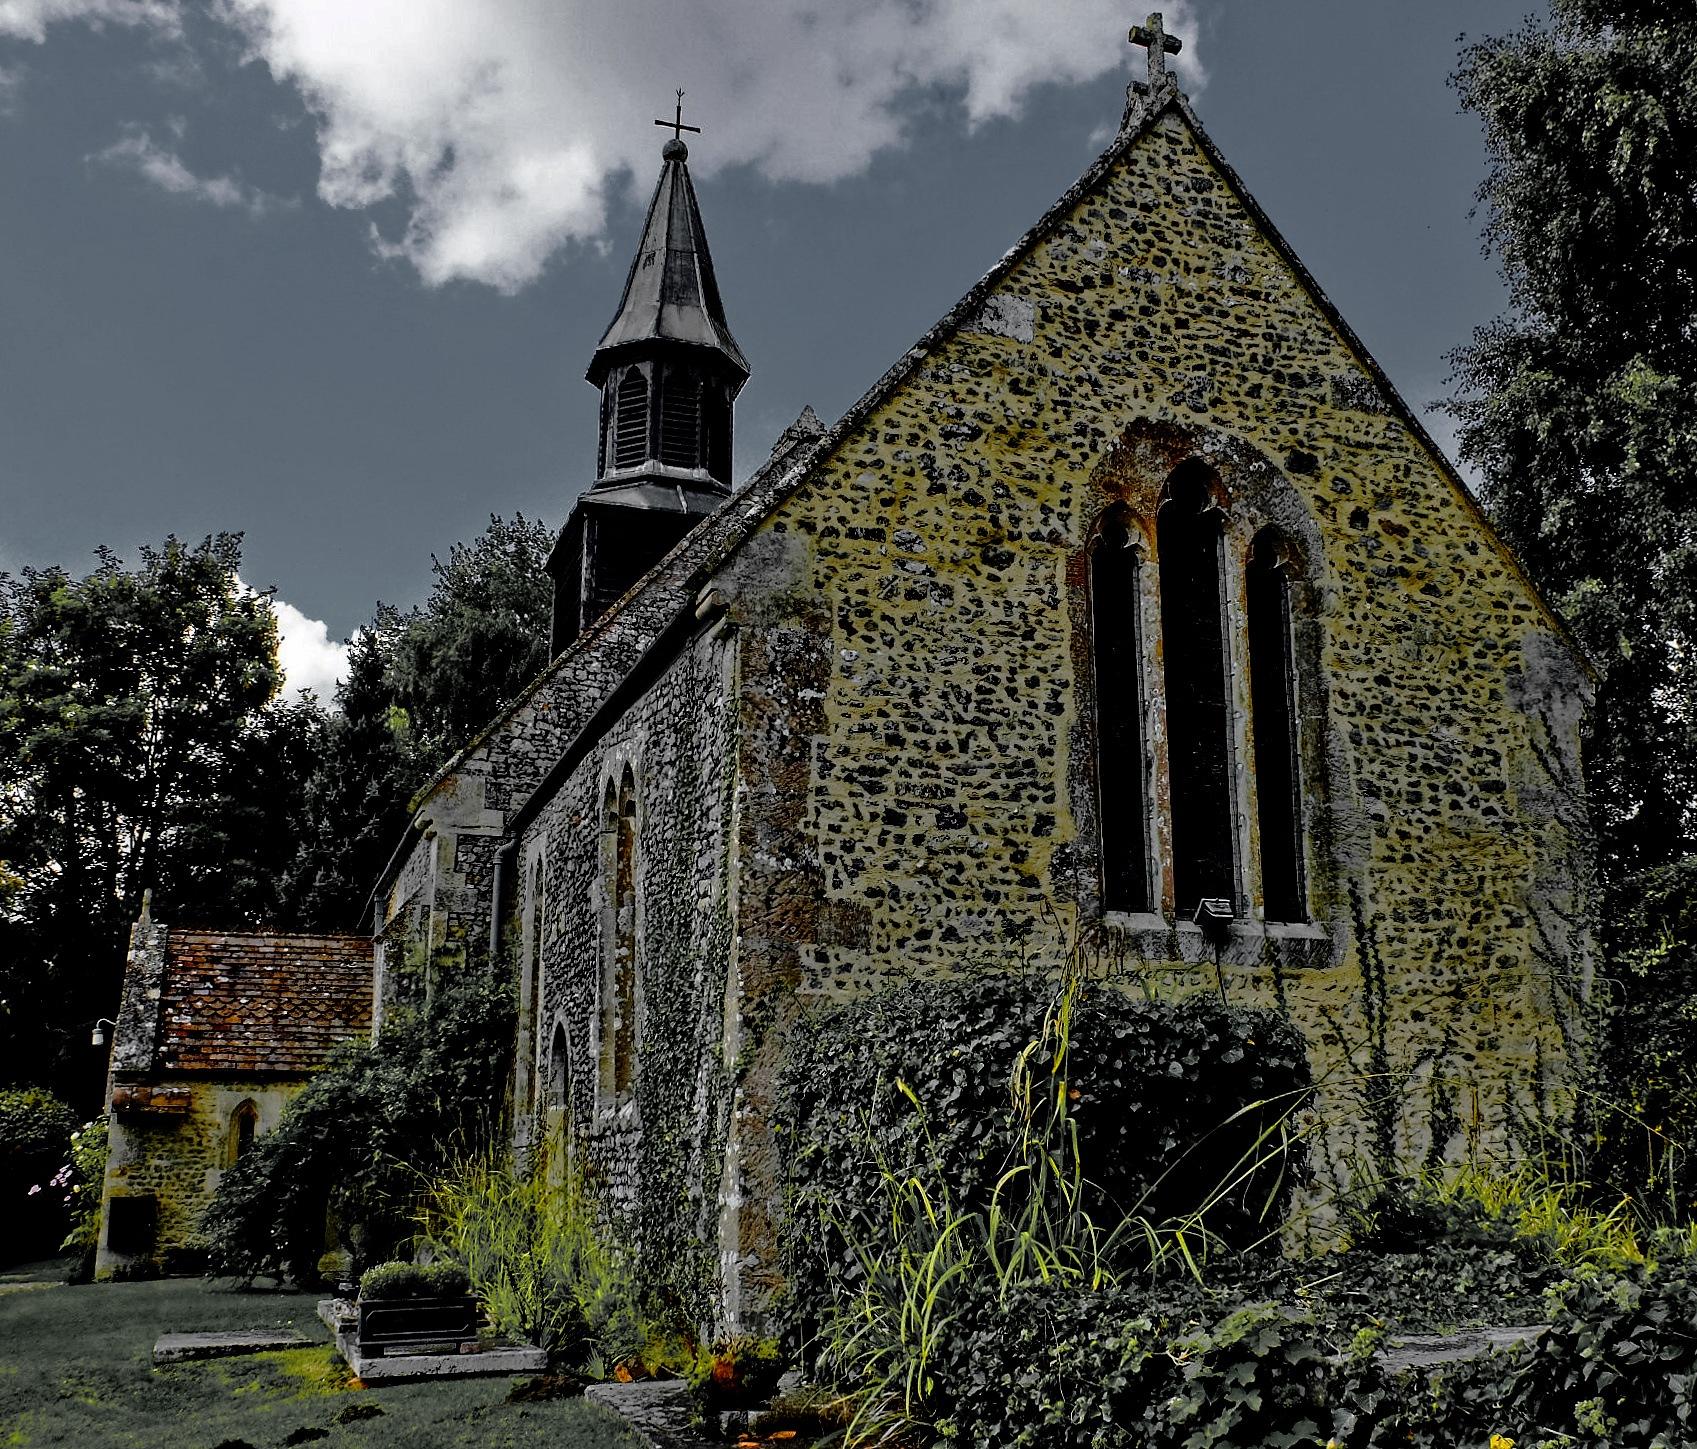 St Swithin's Church - Patney by Keith Patrak